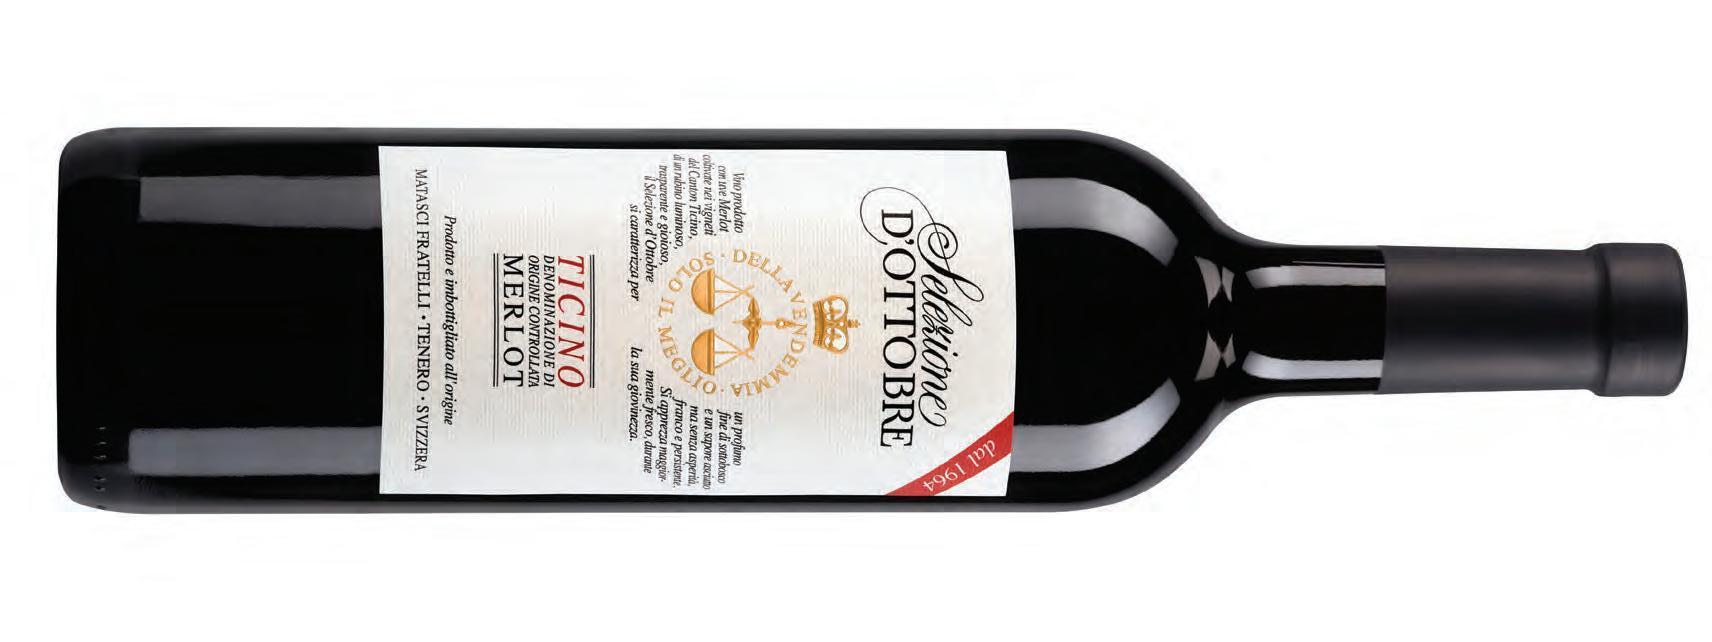 Page 130 of Cantine vinicole Weinkellerei